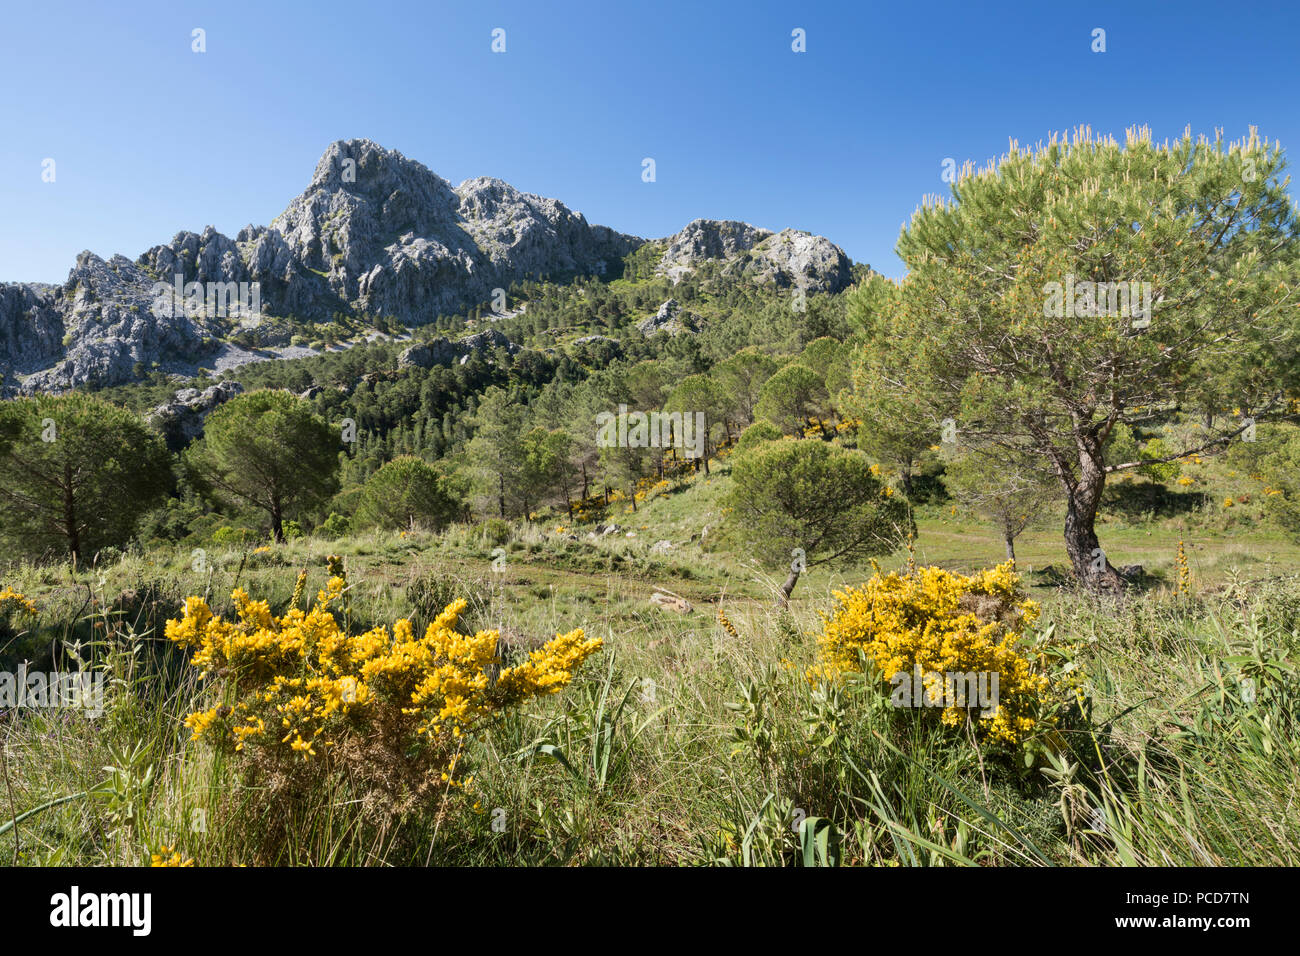 Rugged mountain scenery in spring near Grazalema, Sierra de Grazalema Natural Park, Andalucia, Spain, Europe Stock Photo